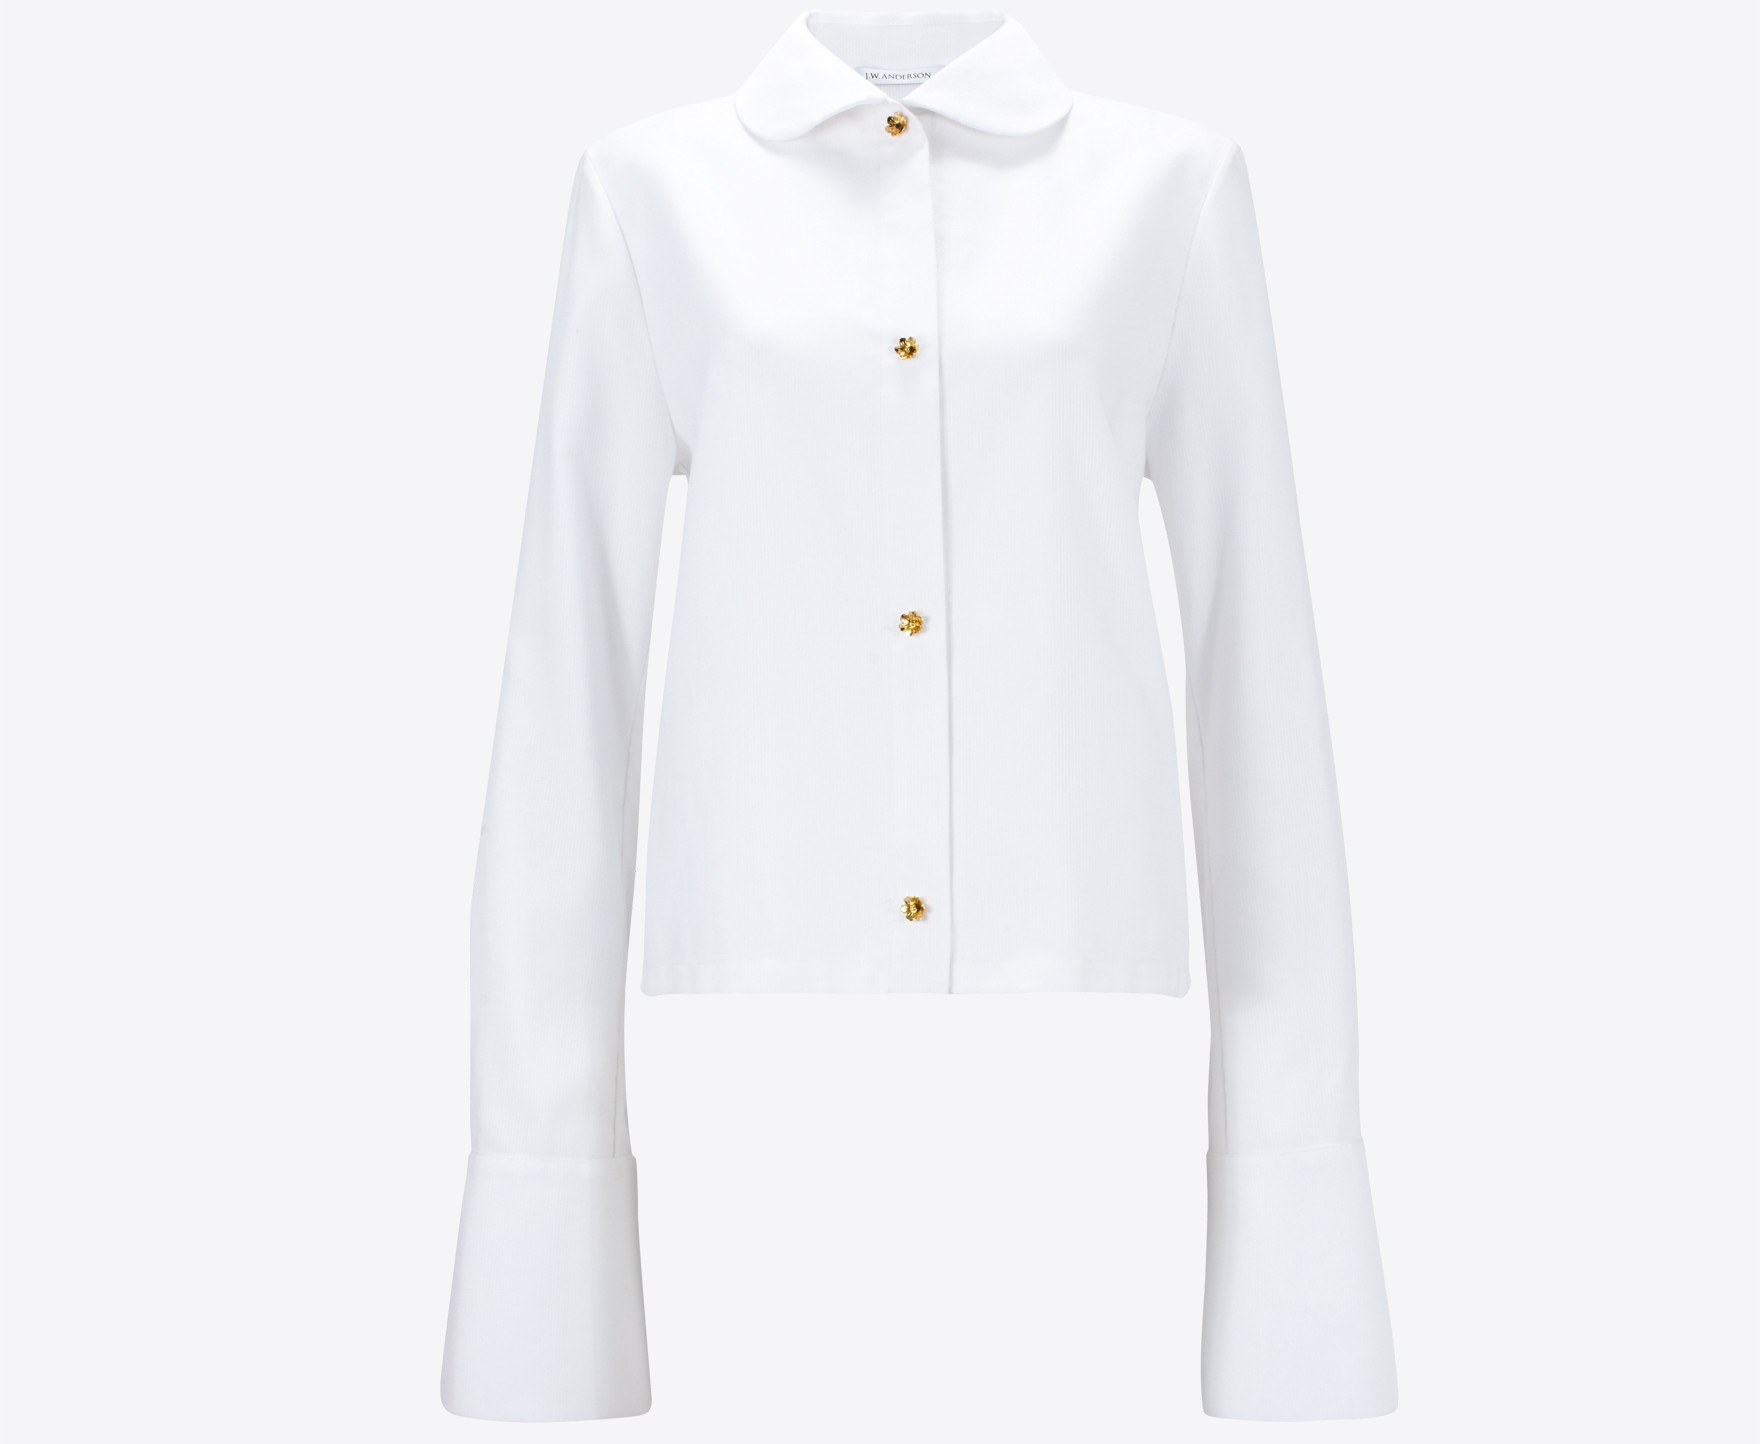 Amazing  French White Shirts For Women French Cuff Shirts Women Shirts For